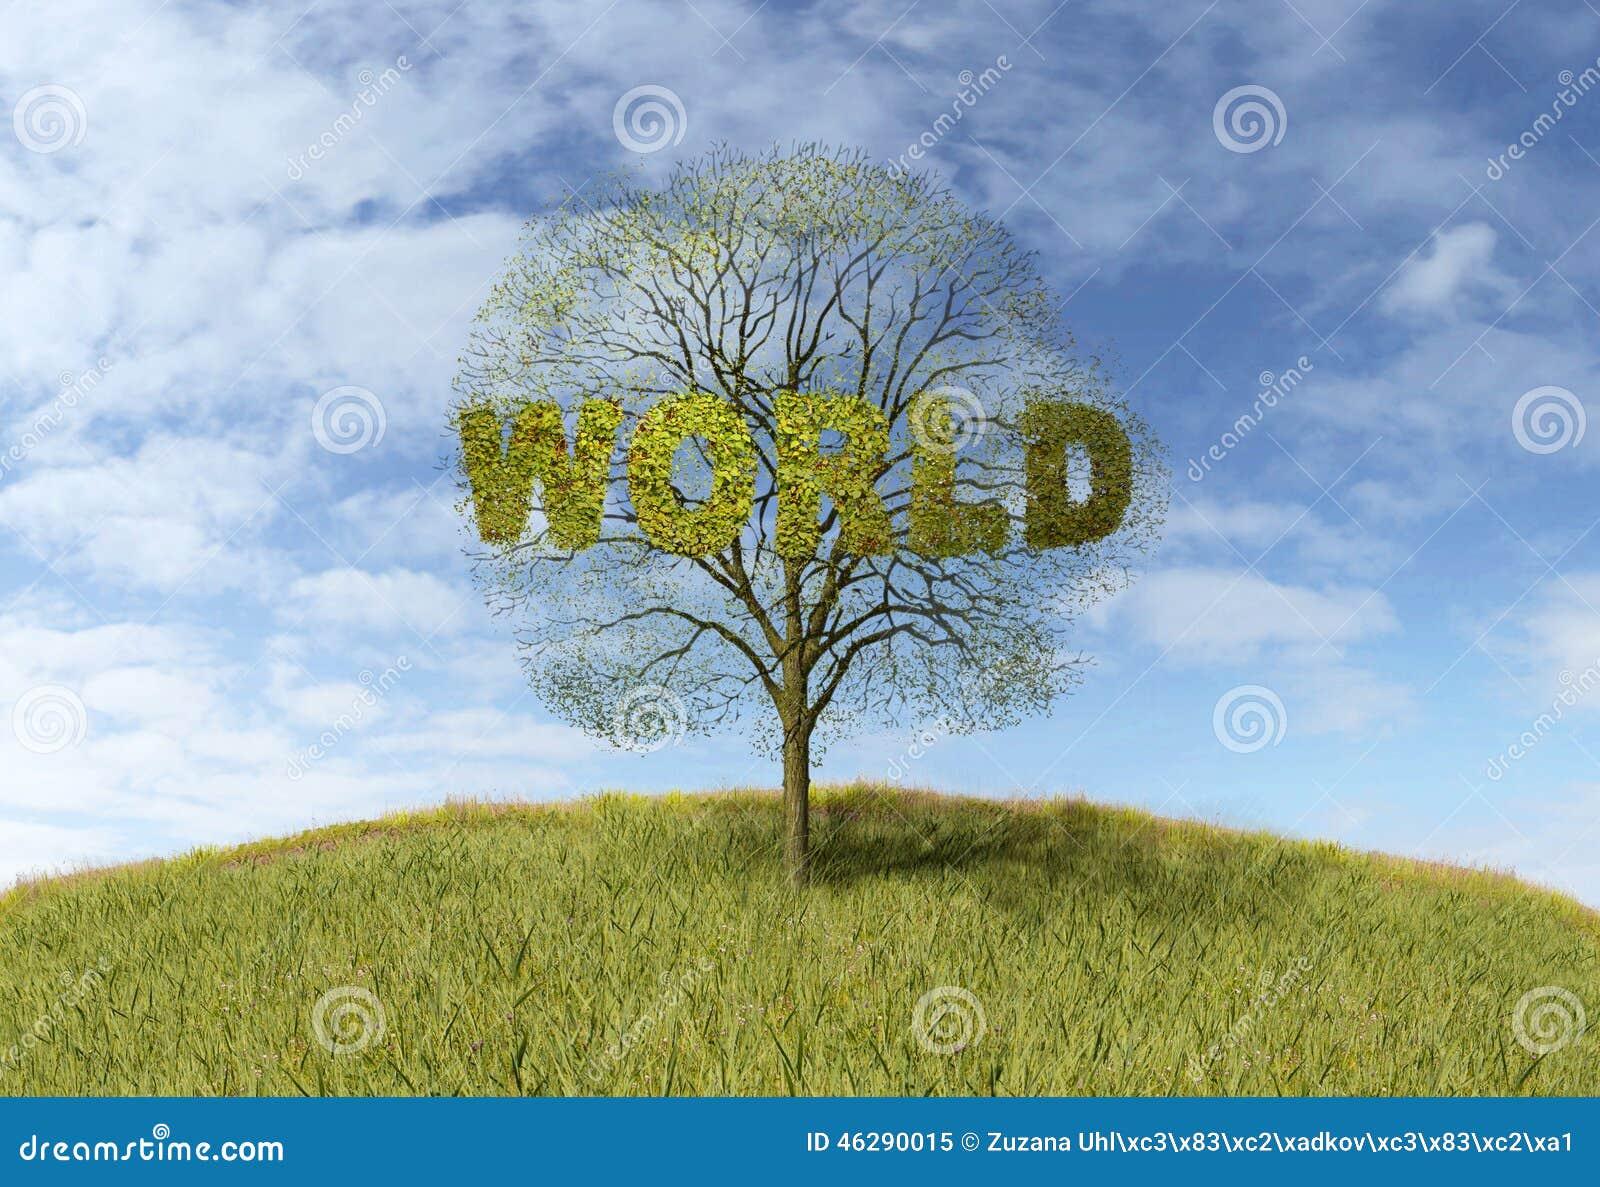 Teksta światu drzewo